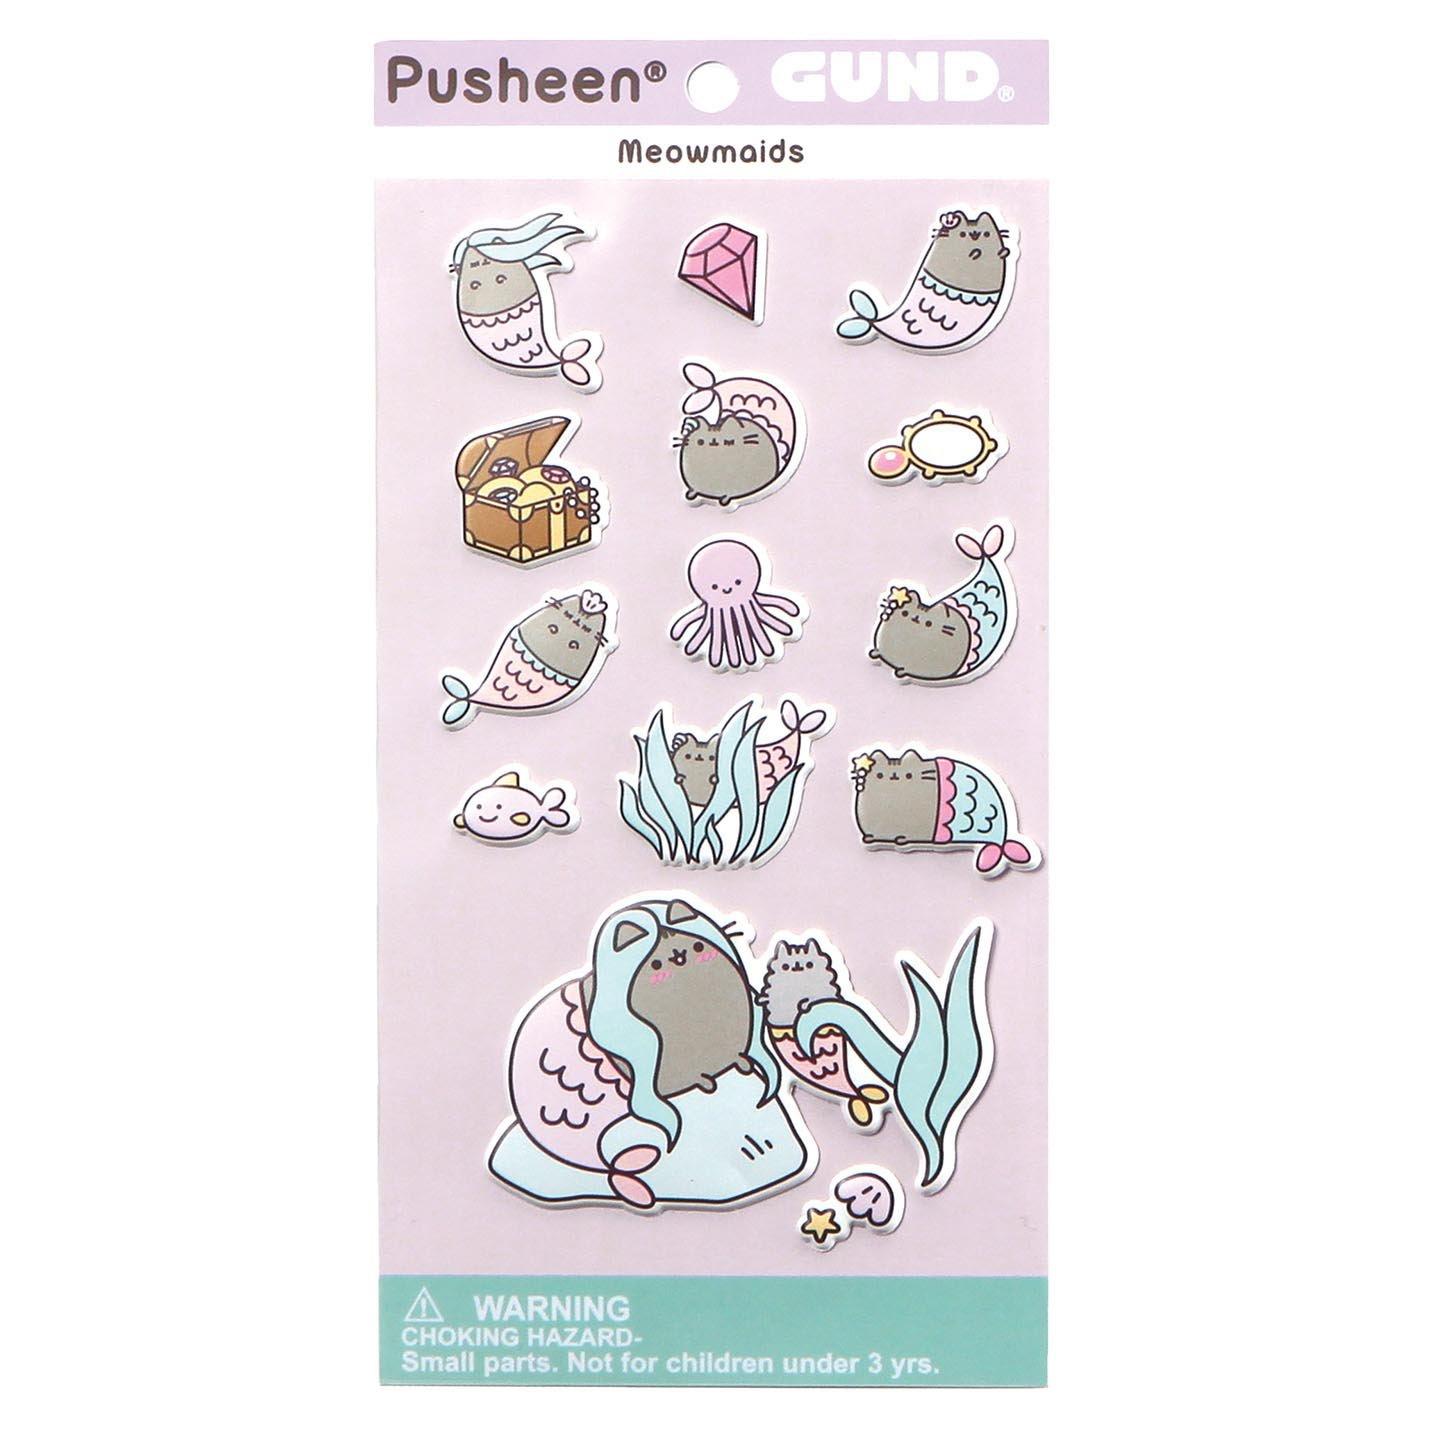 Gund Pusheen Sirenita Sticker,, 9x18.5x13.00 cm (Enesco 4060832)